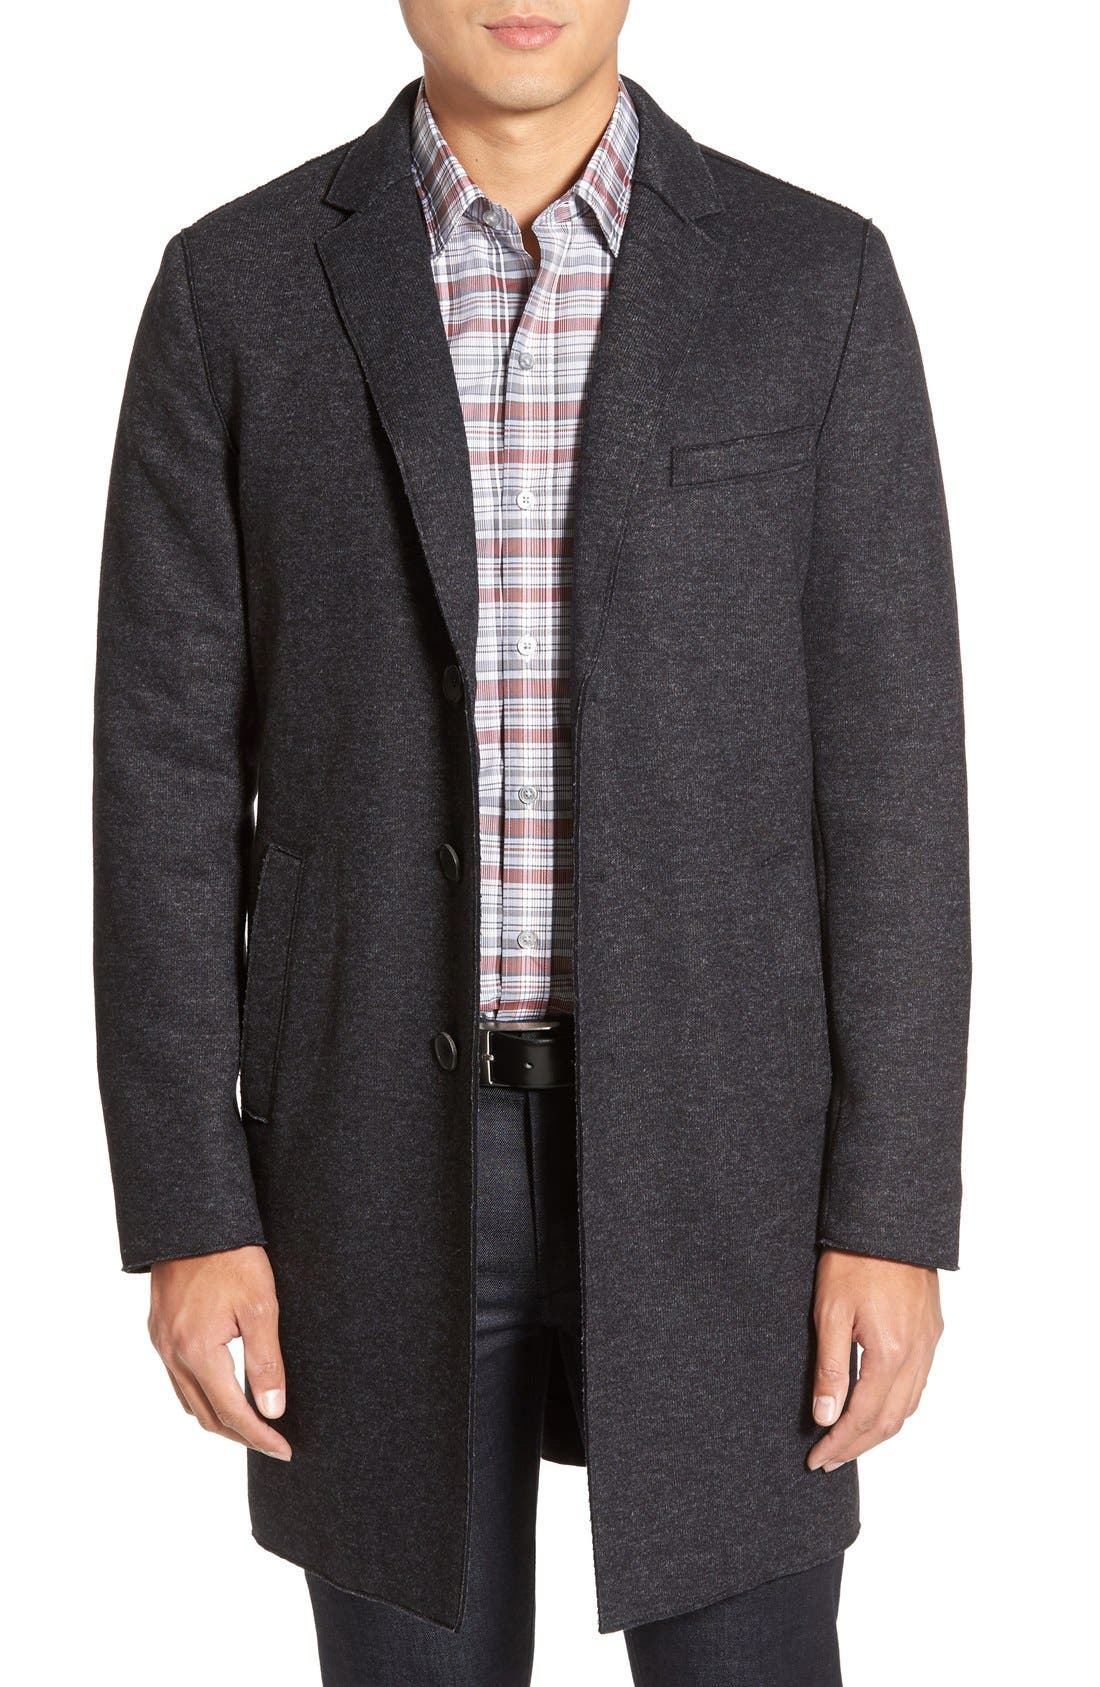 BOSS 'Shawn' Wool Blend Overcoat,                             Main thumbnail 1, color,                             402